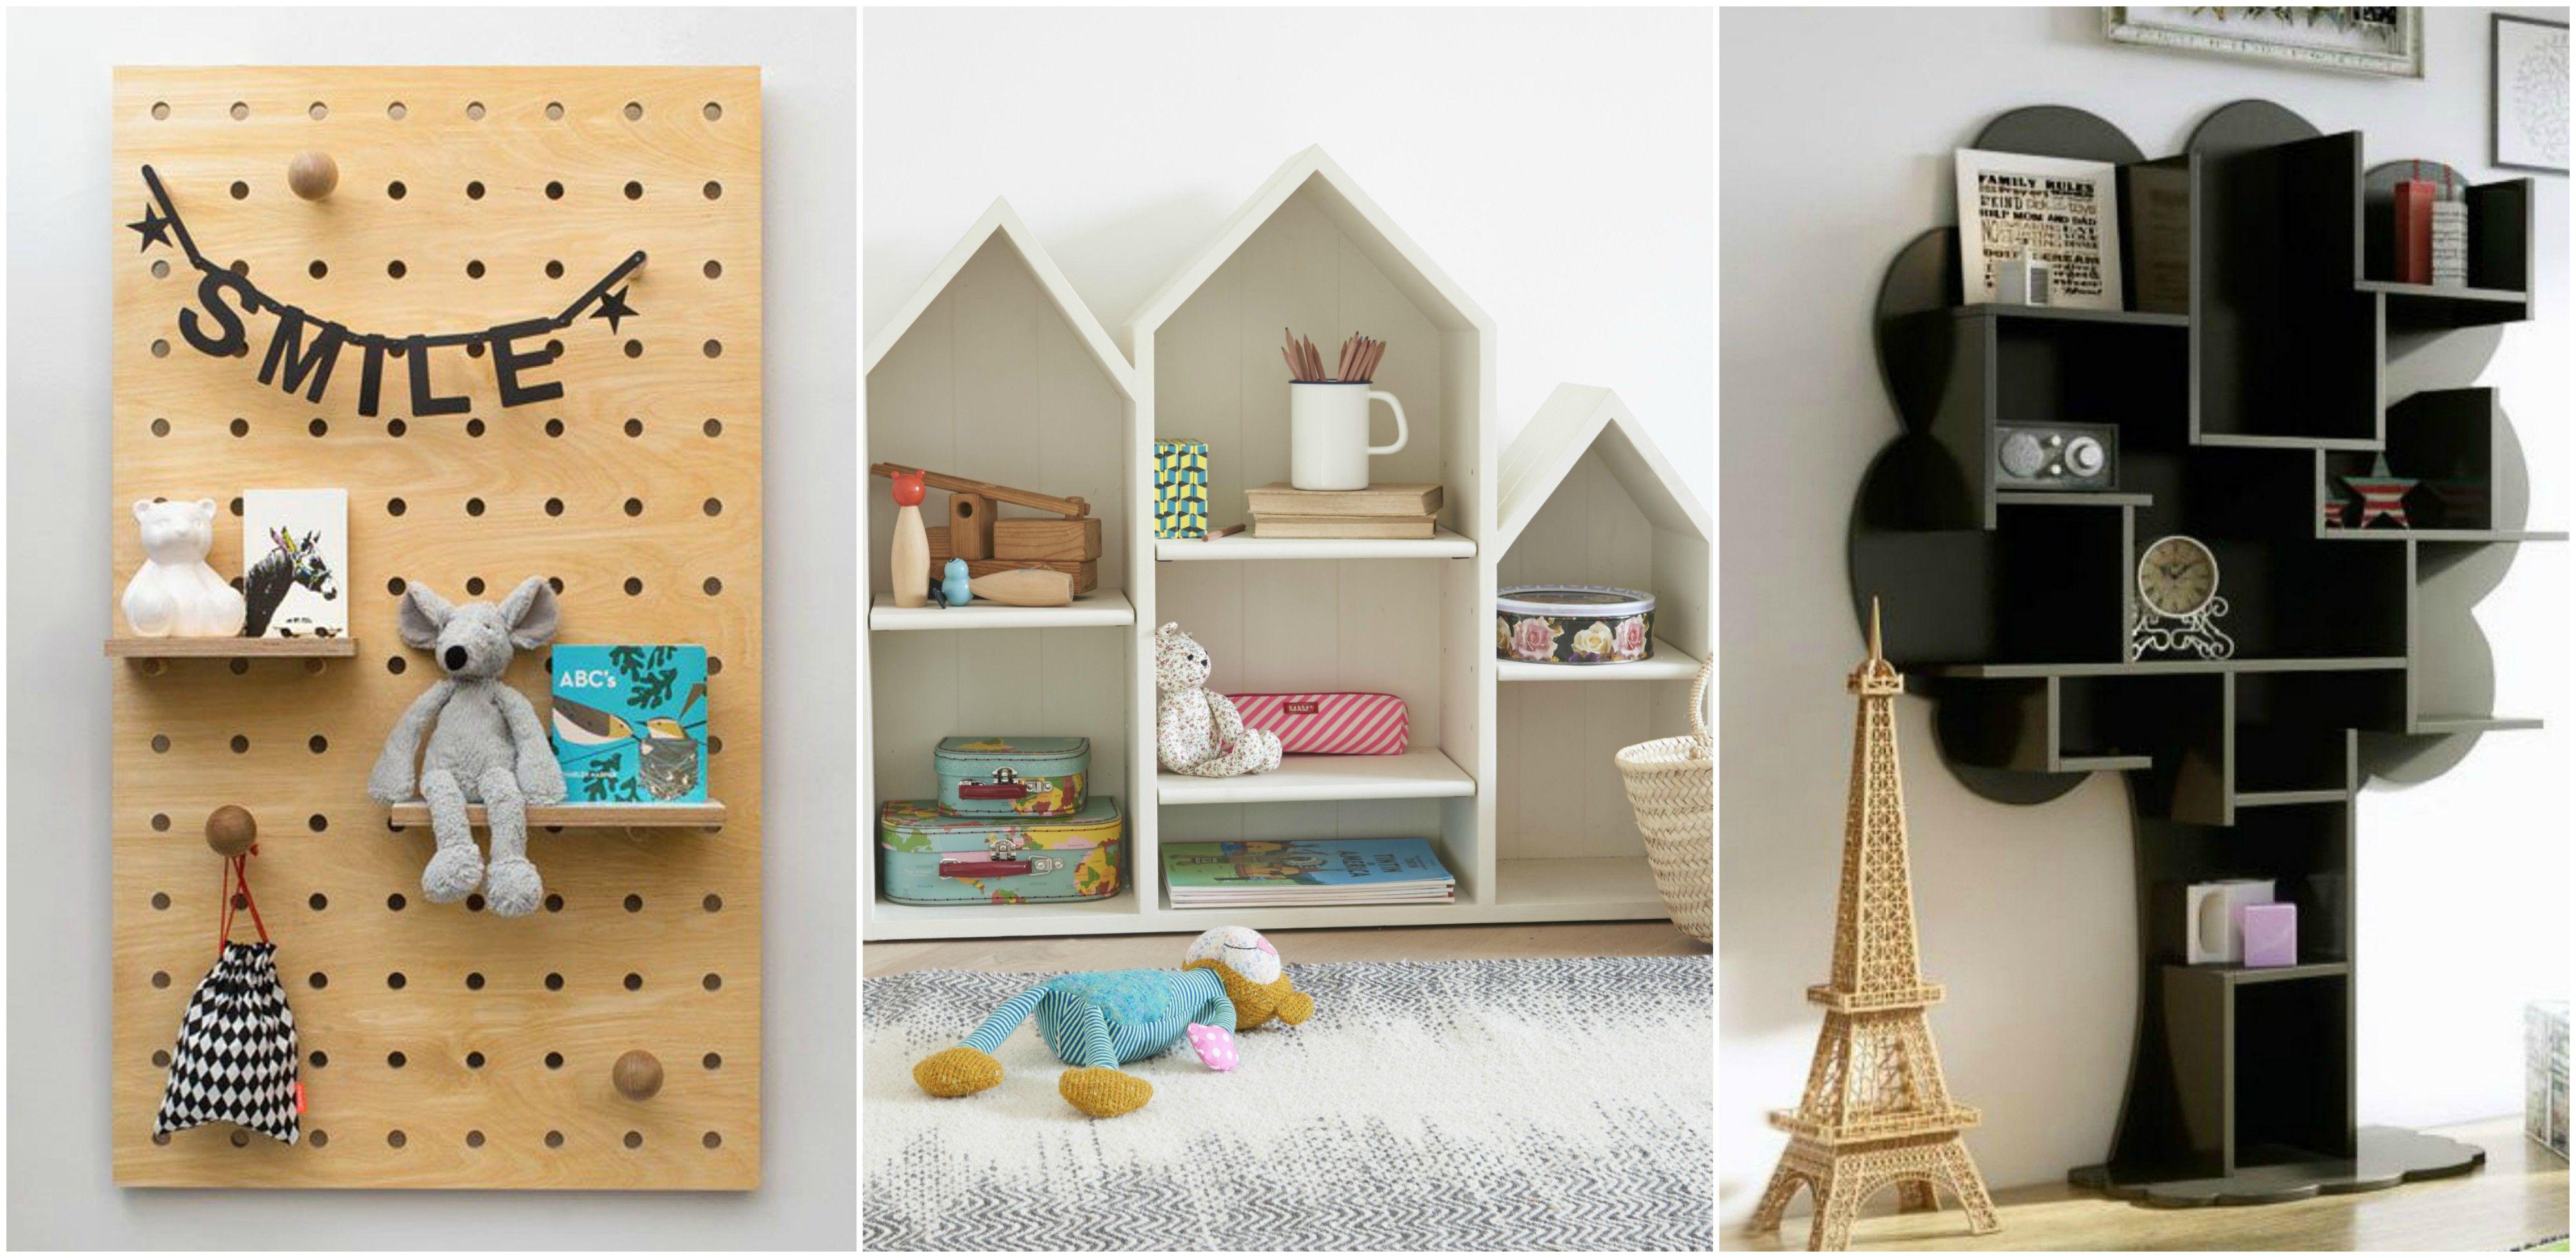 10 Children S Room Storage Ideas Kids Bedroom And